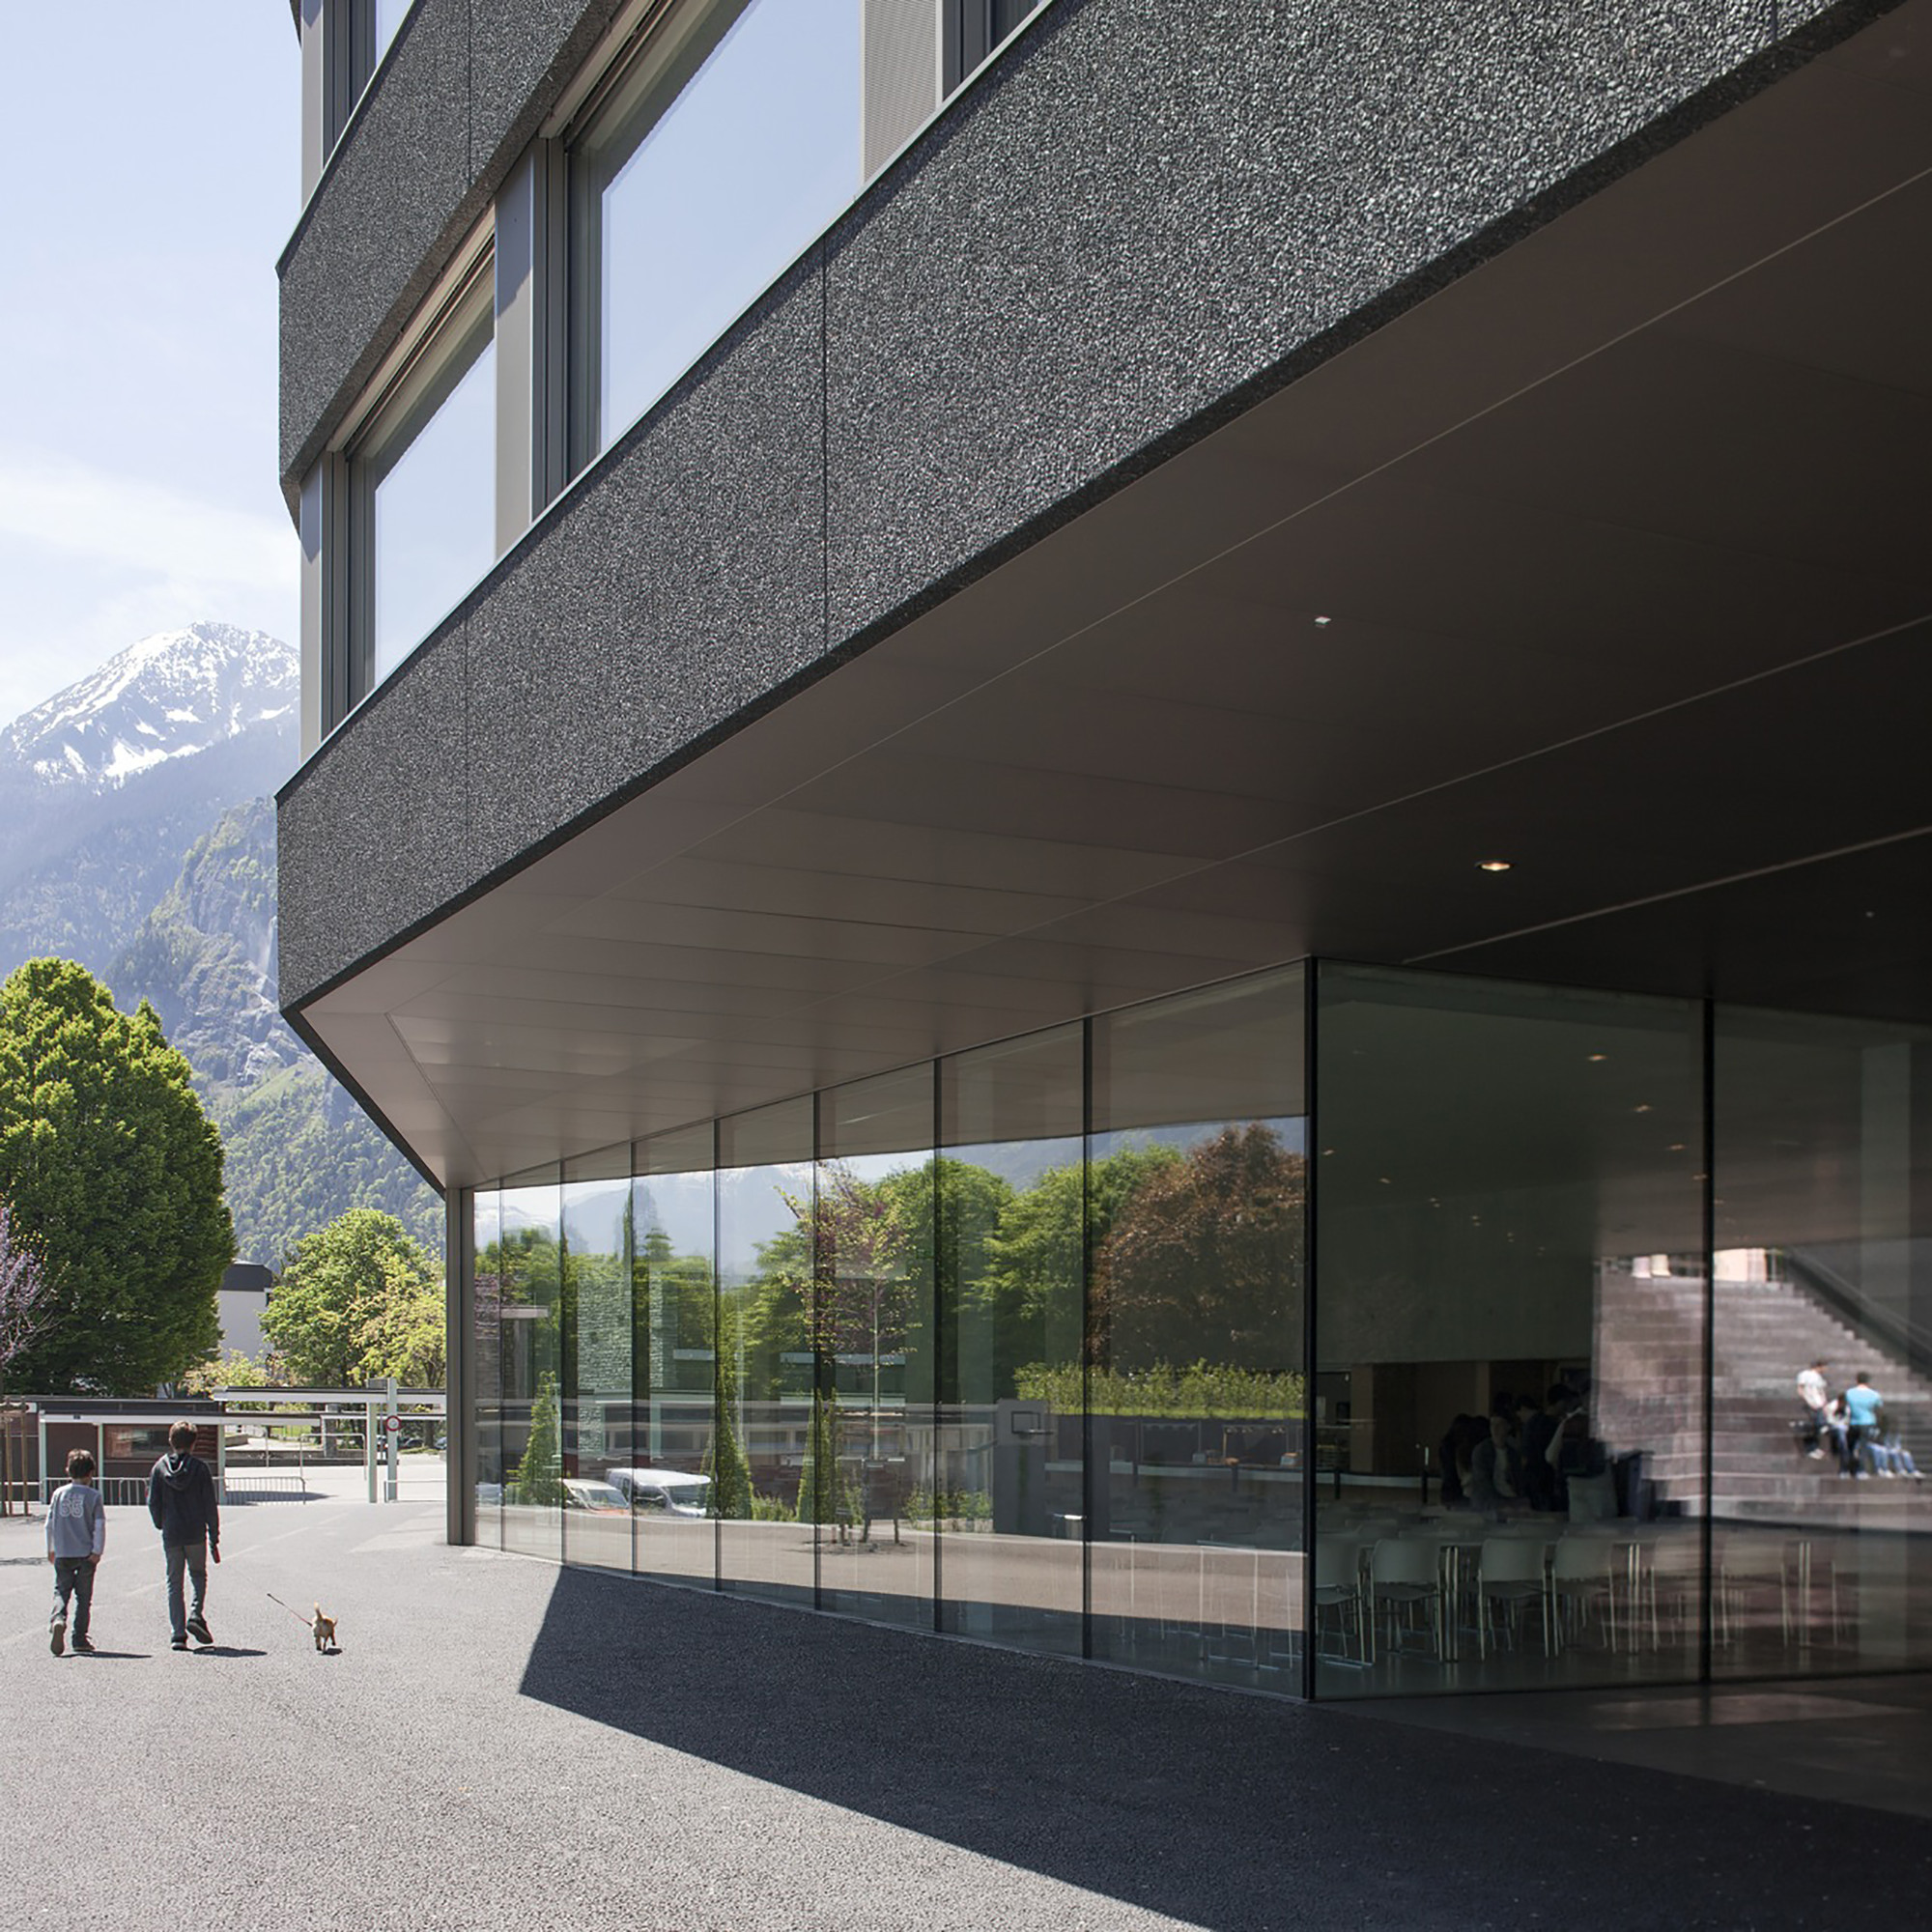 Galeria Stl: Galeria De Escola Em Saint-Maurice / Graeme Mann